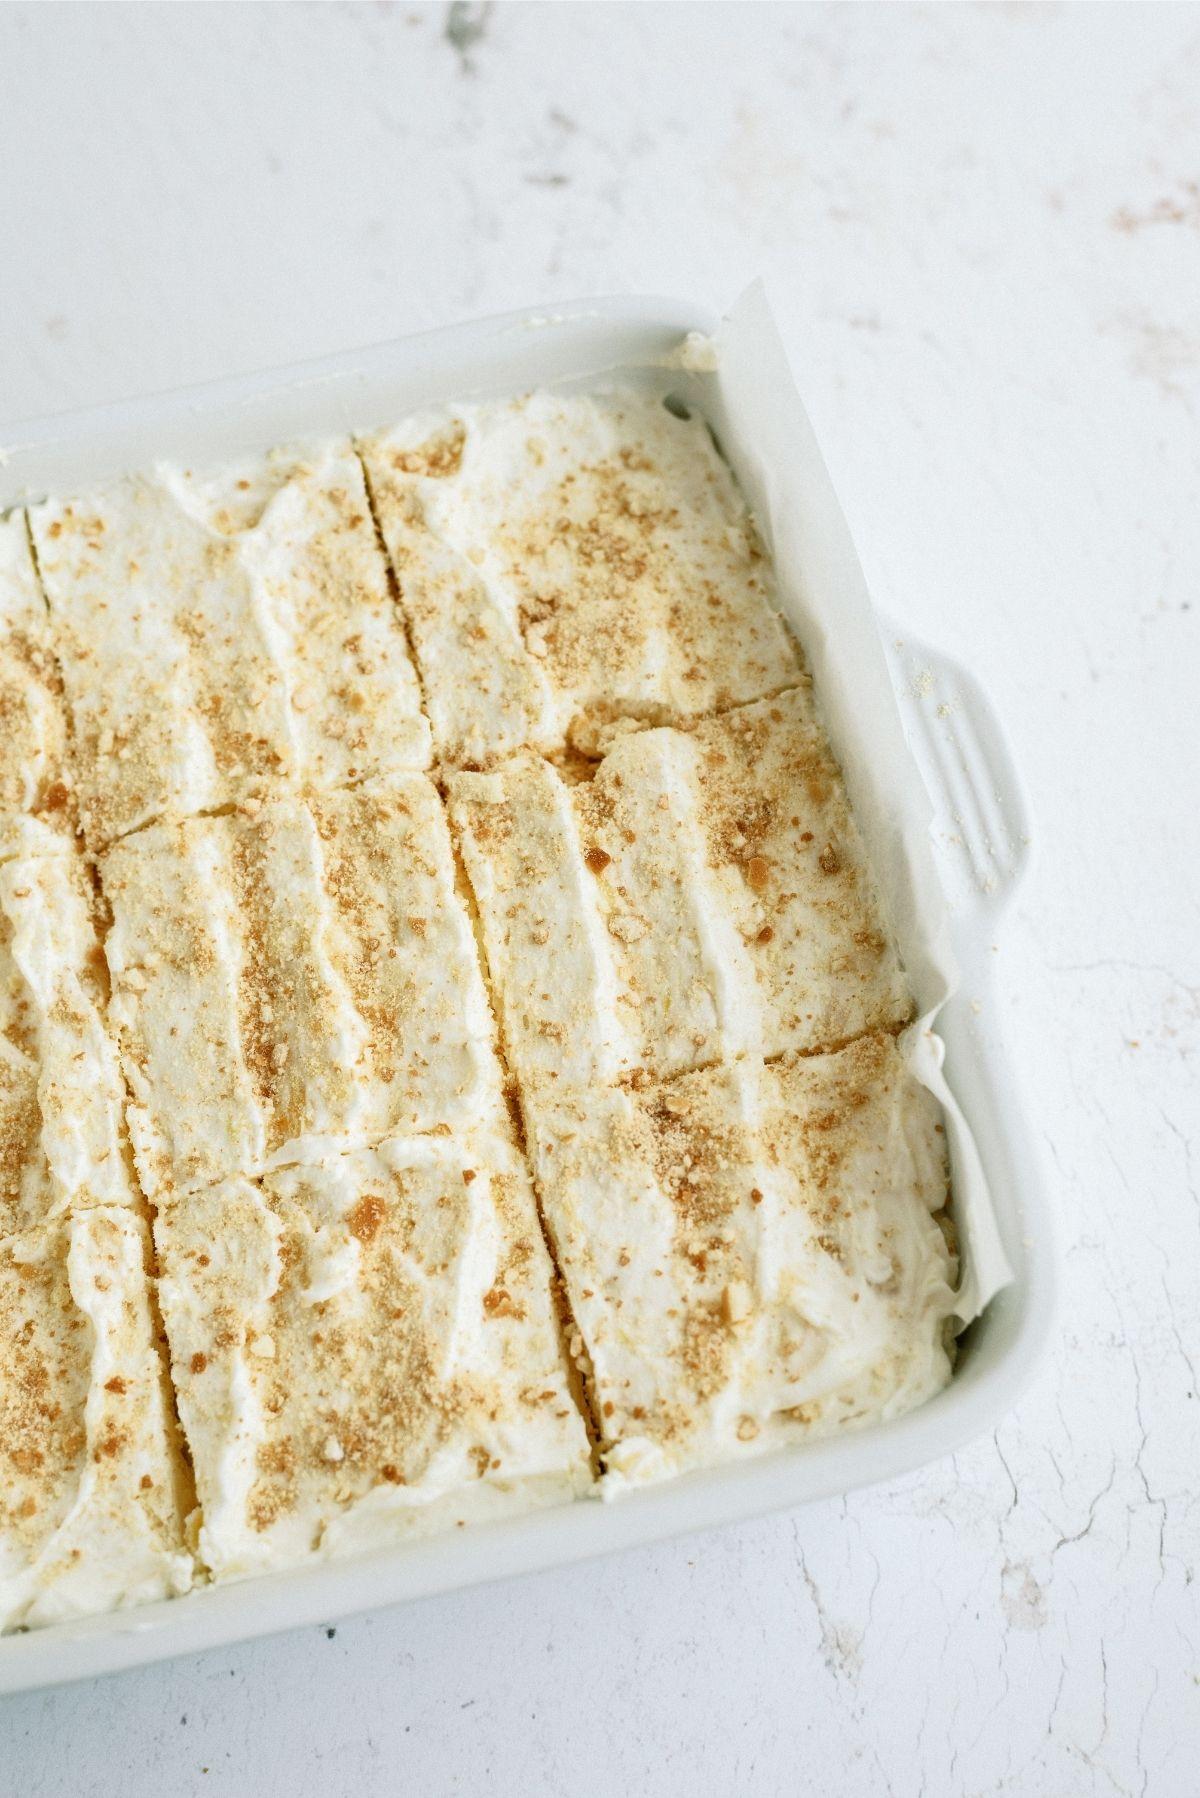 Fluffy Cream Cheese Dessert in pan sliced